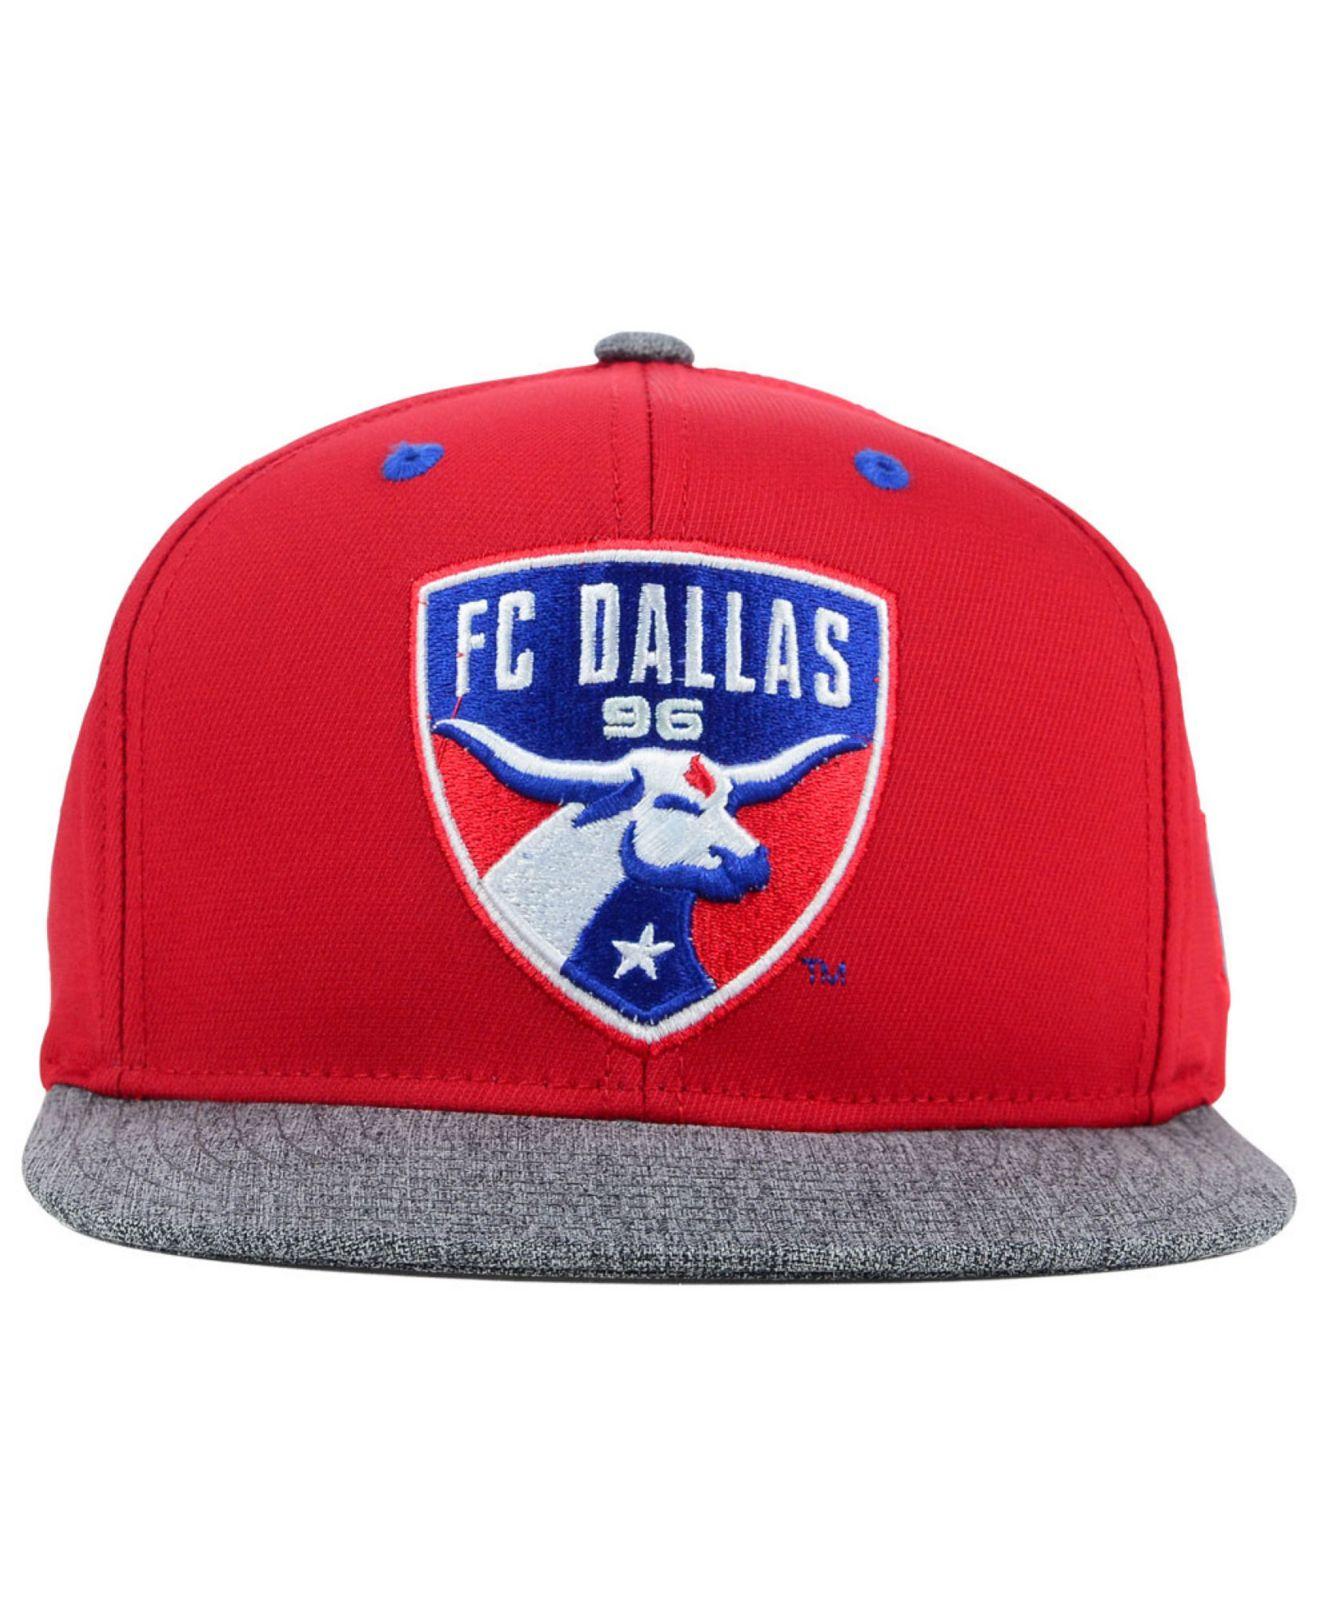 low priced ab07e b4902 Lyst - adidas Originals Fc Dallas Team Snapback Cap in Red for Men